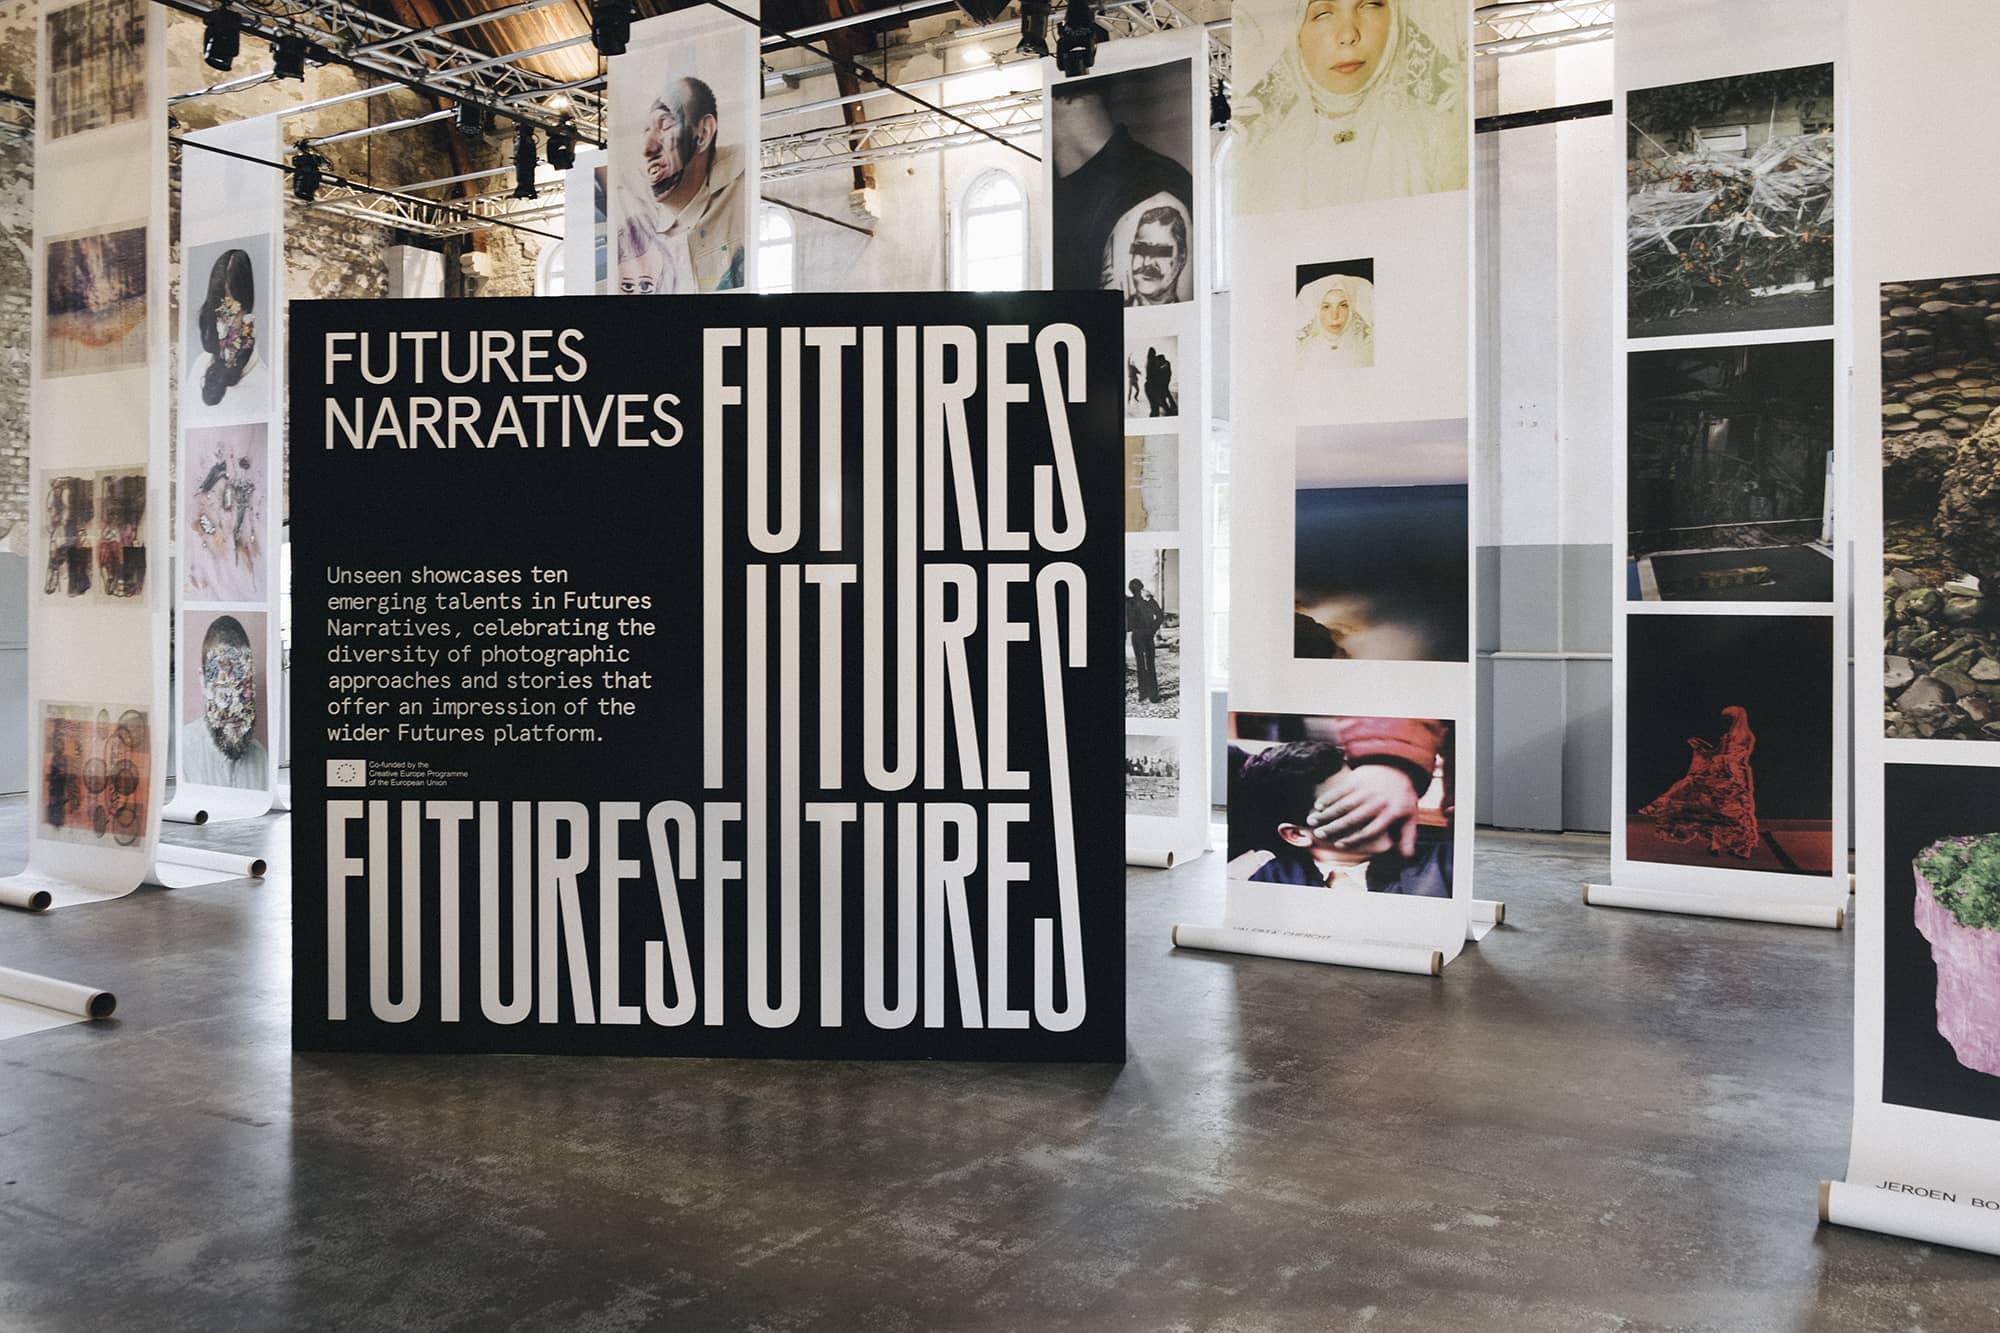 Futures Narratives ©Rachel Moron